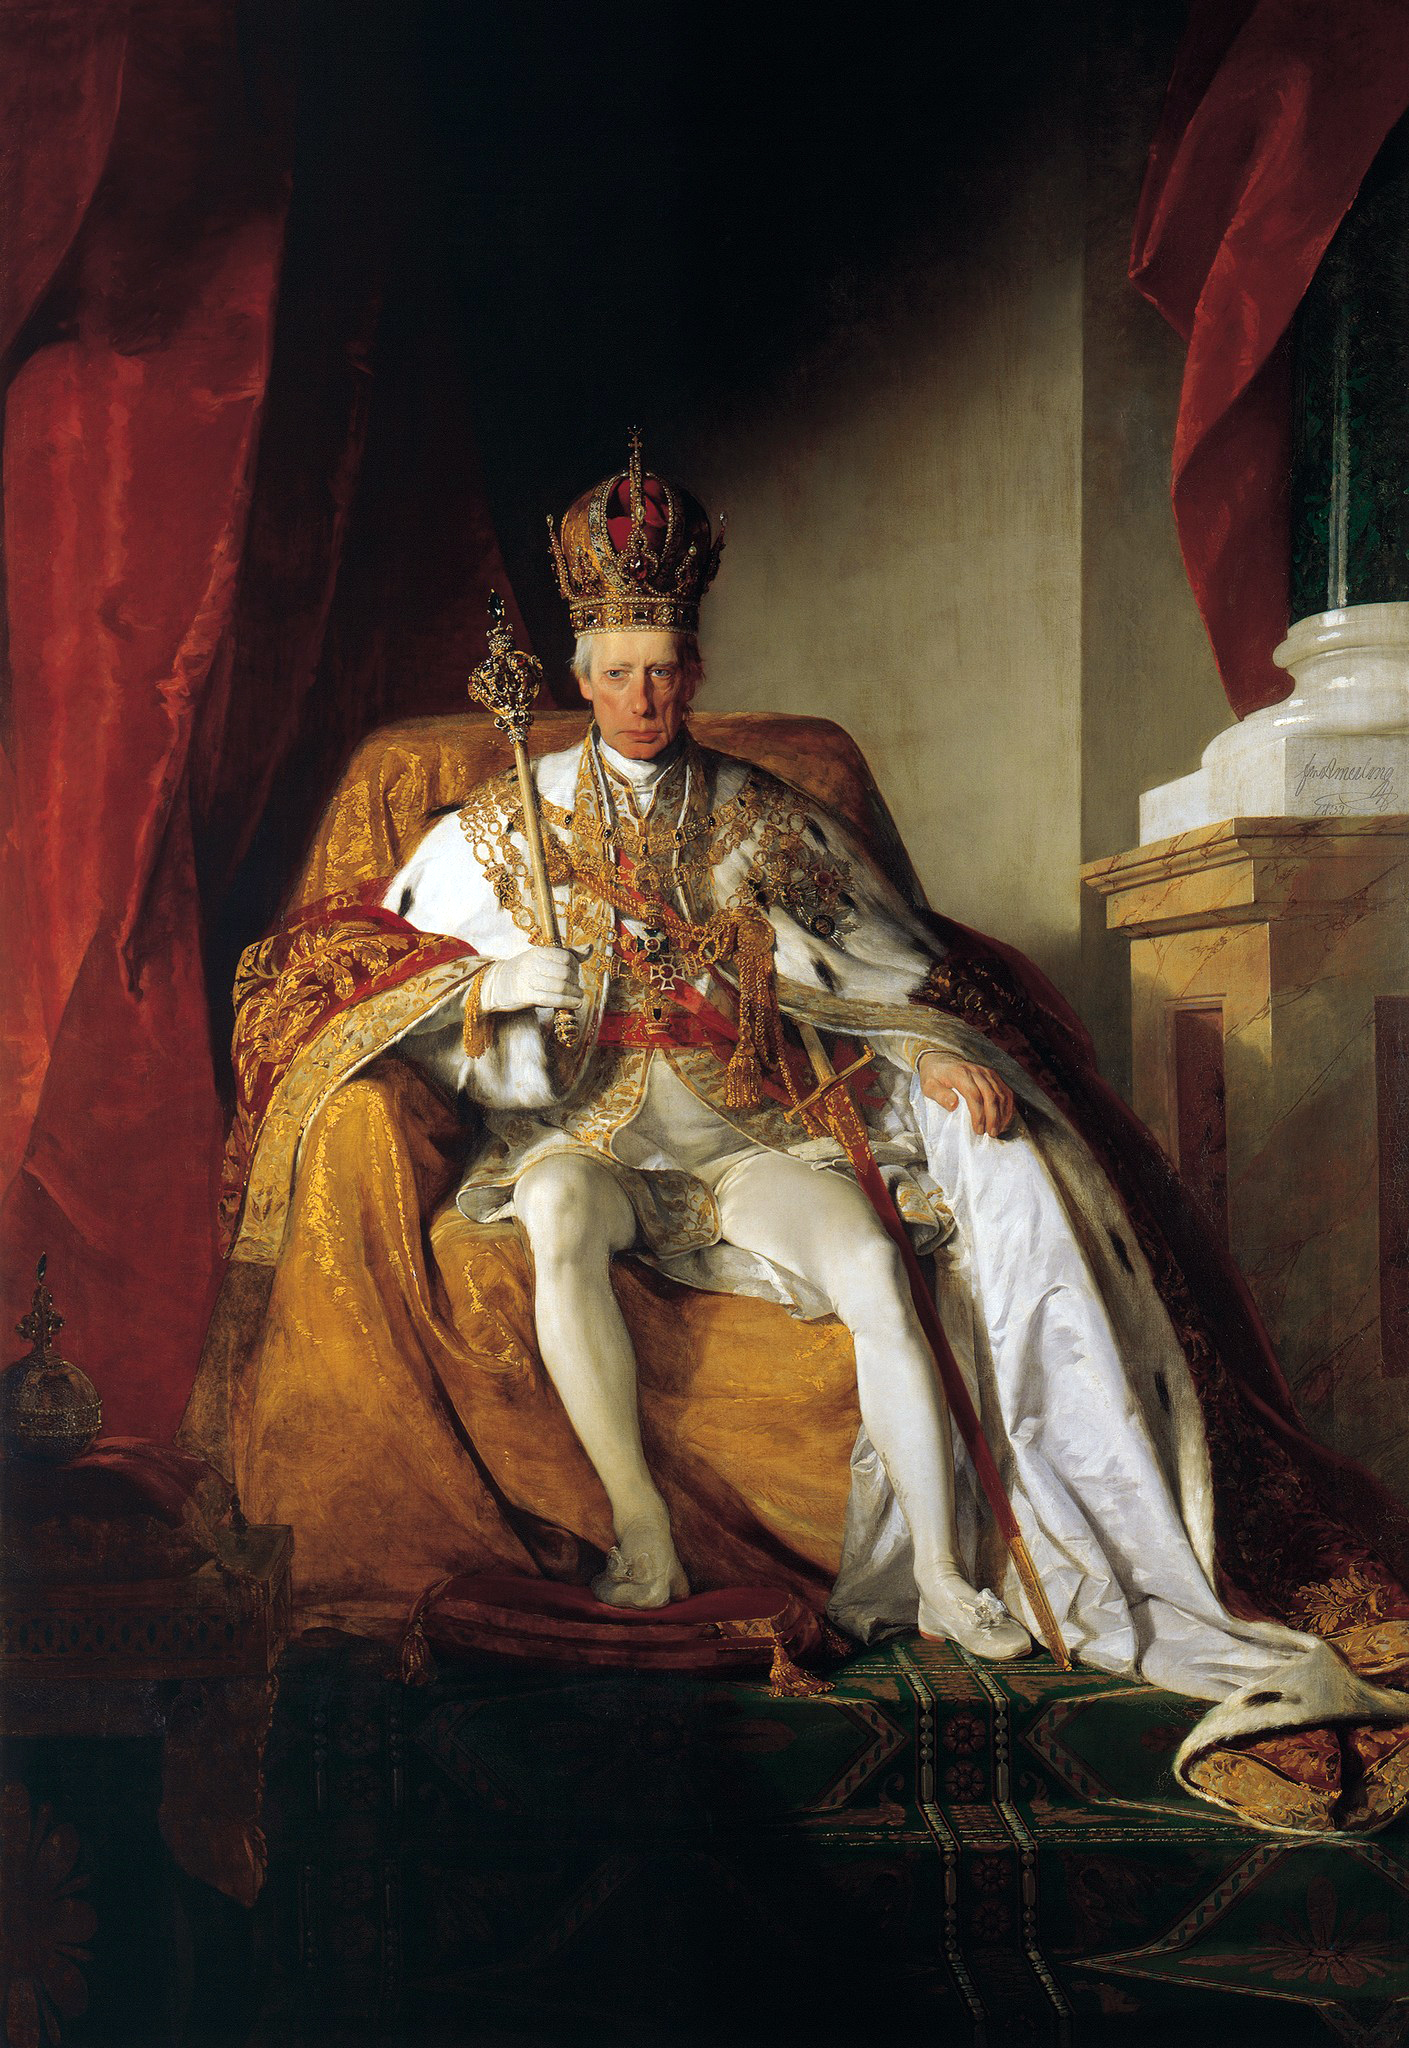 5a398e8c96 Francesco II d'Asburgo-Lorena - Wikipedia